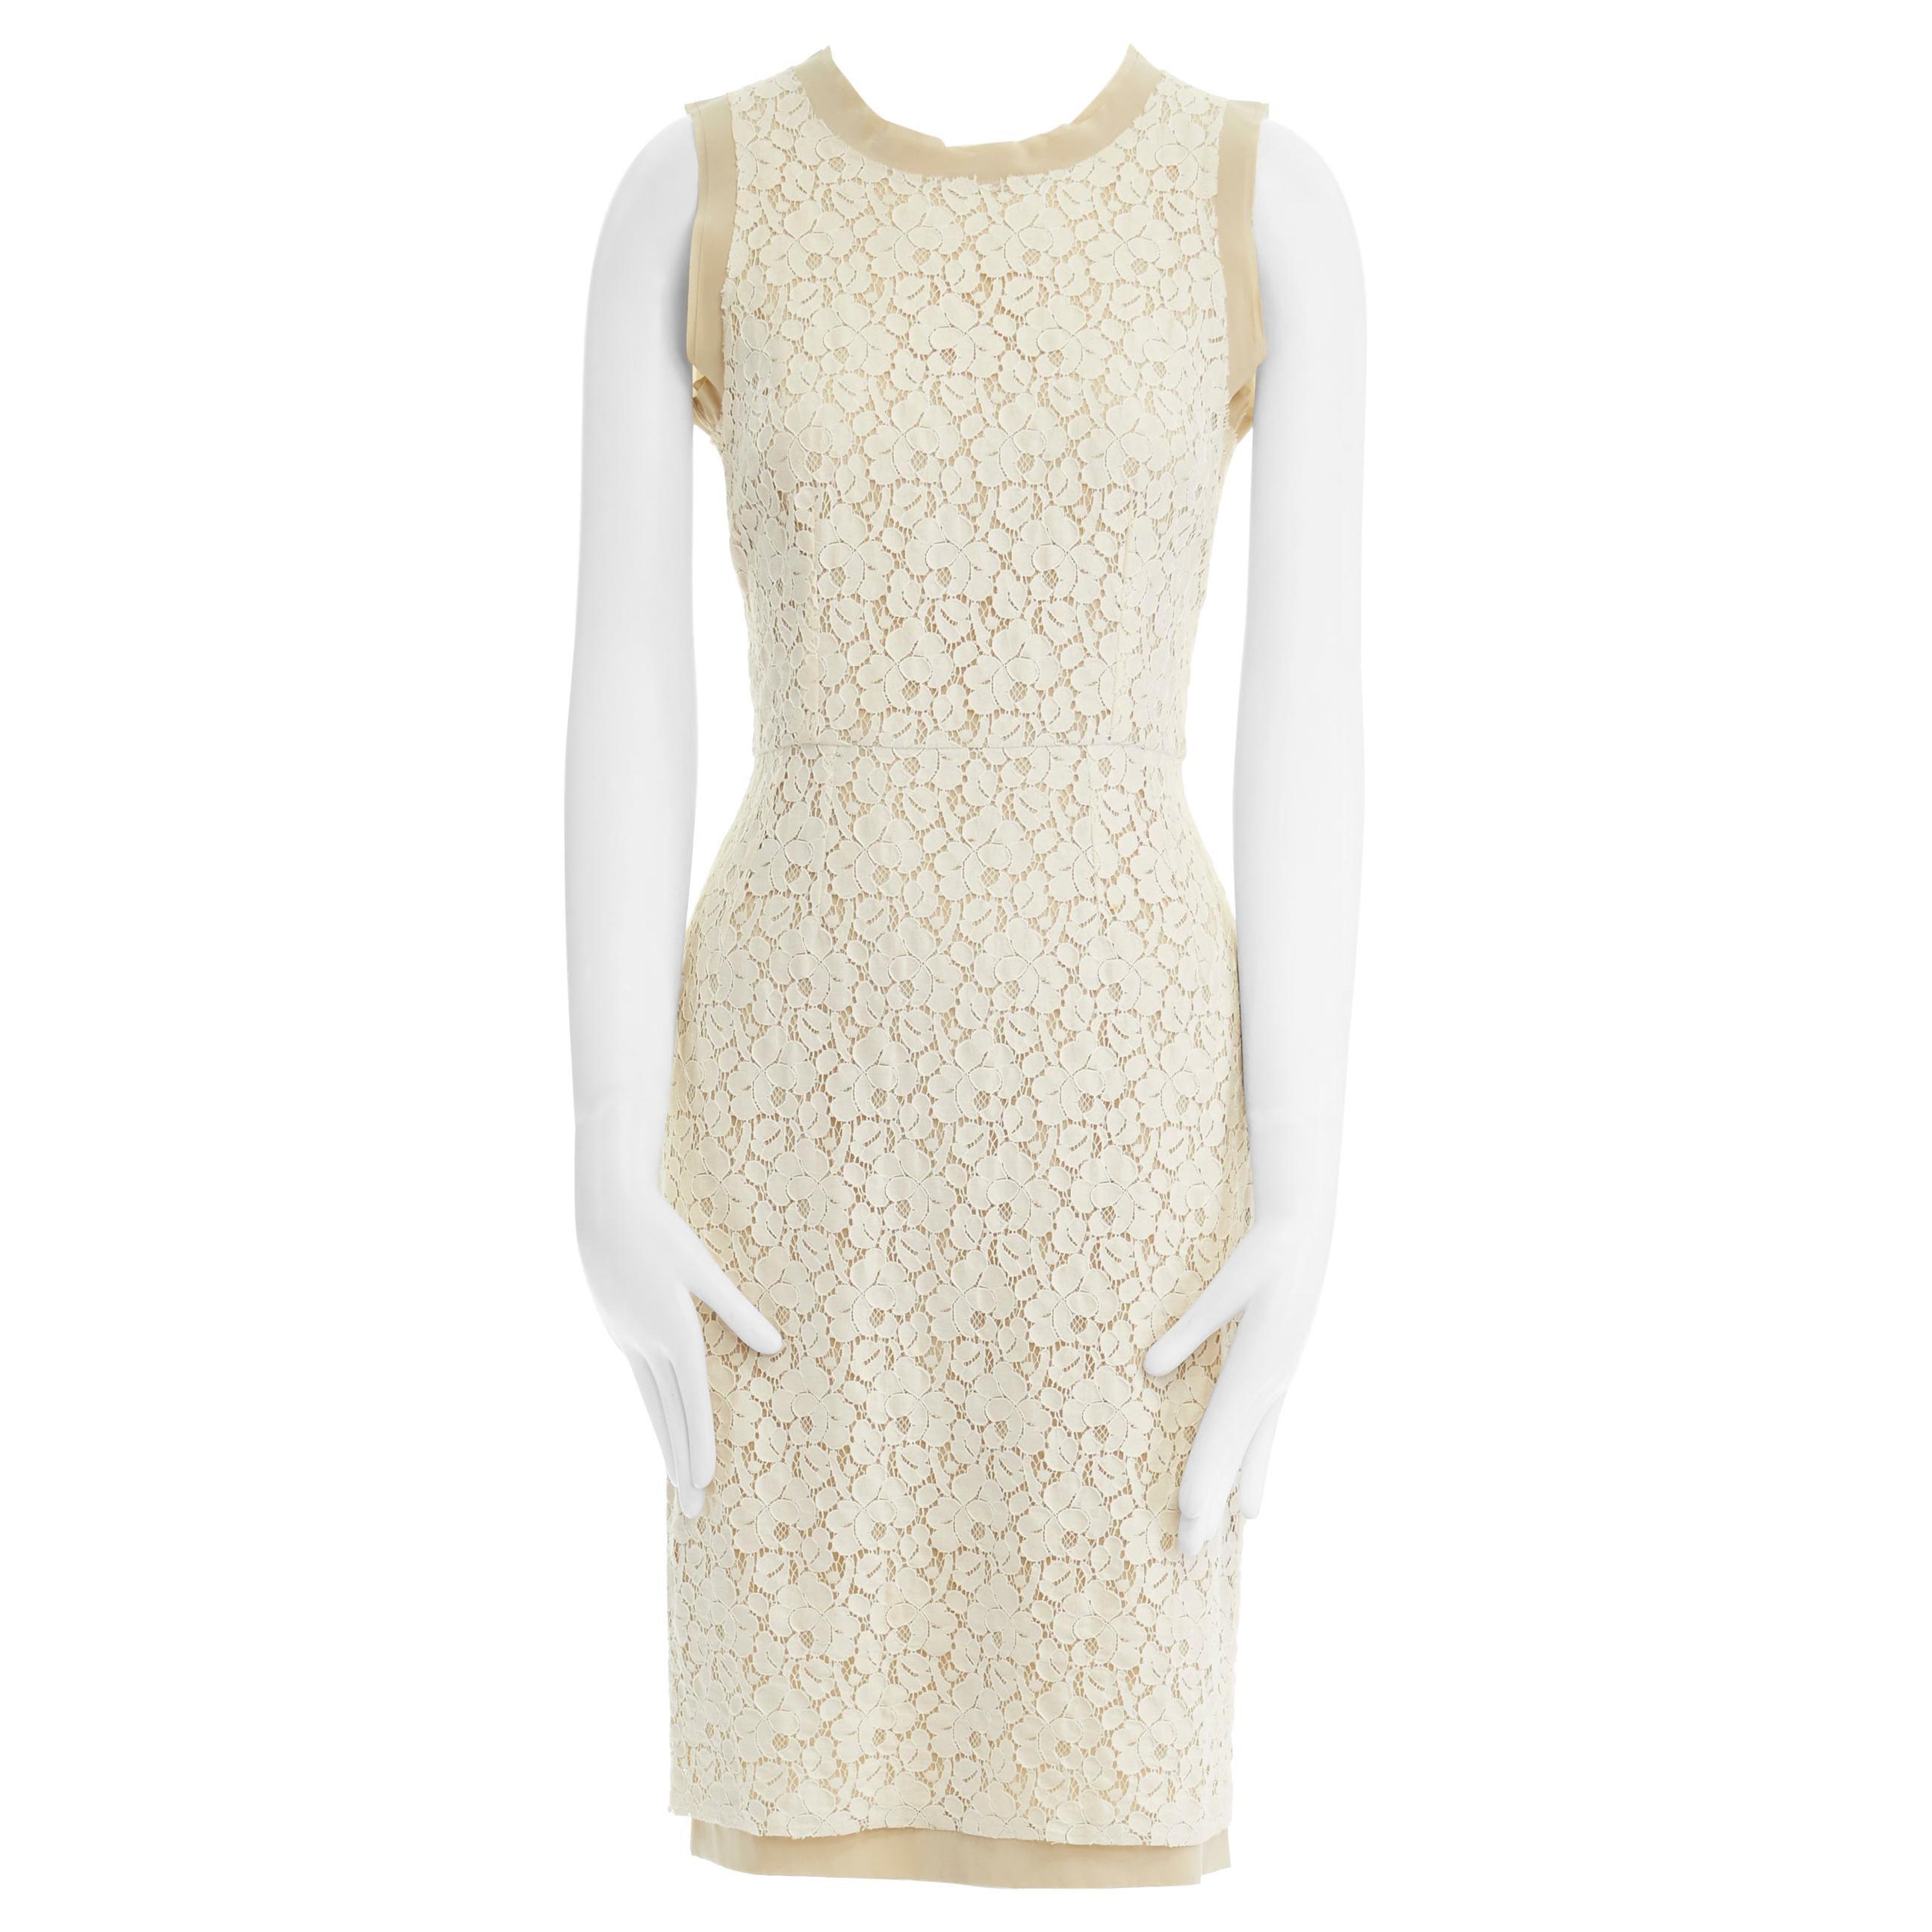 DOLCE GABBANA cream floral lace silk trim sleeveless cocktail dress IT38 XS